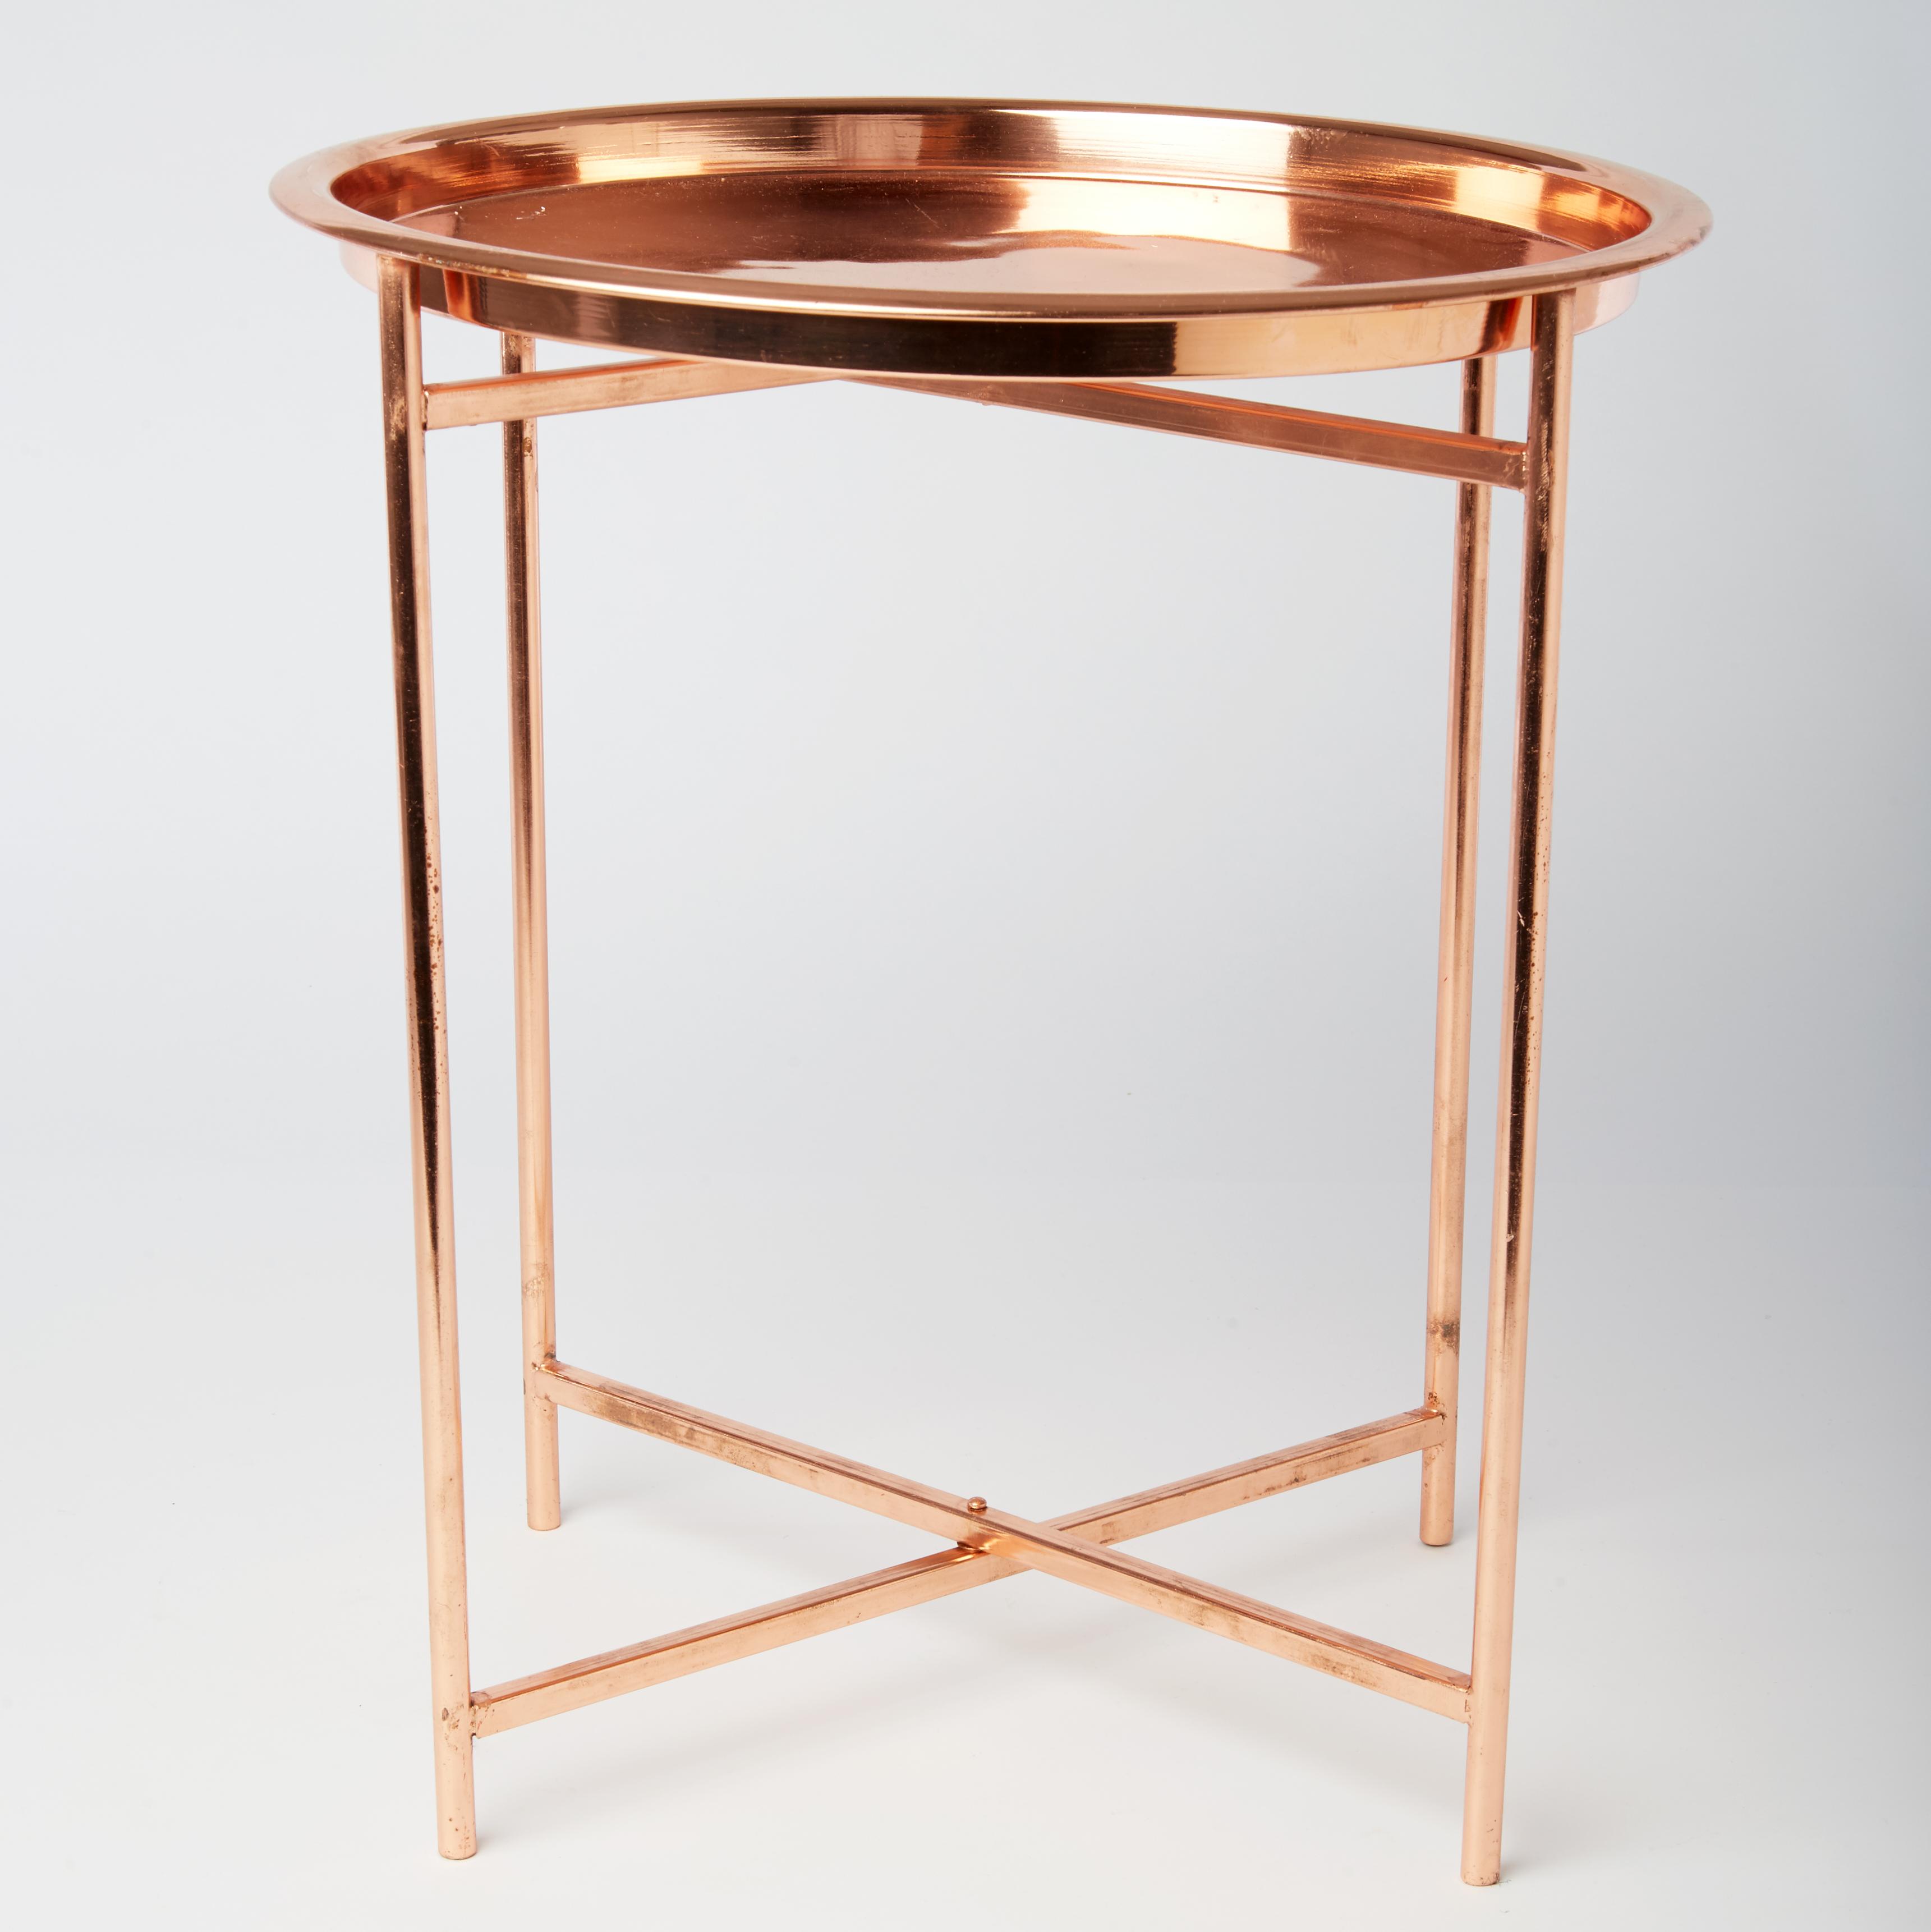 copper folding coffee table melanie falvey